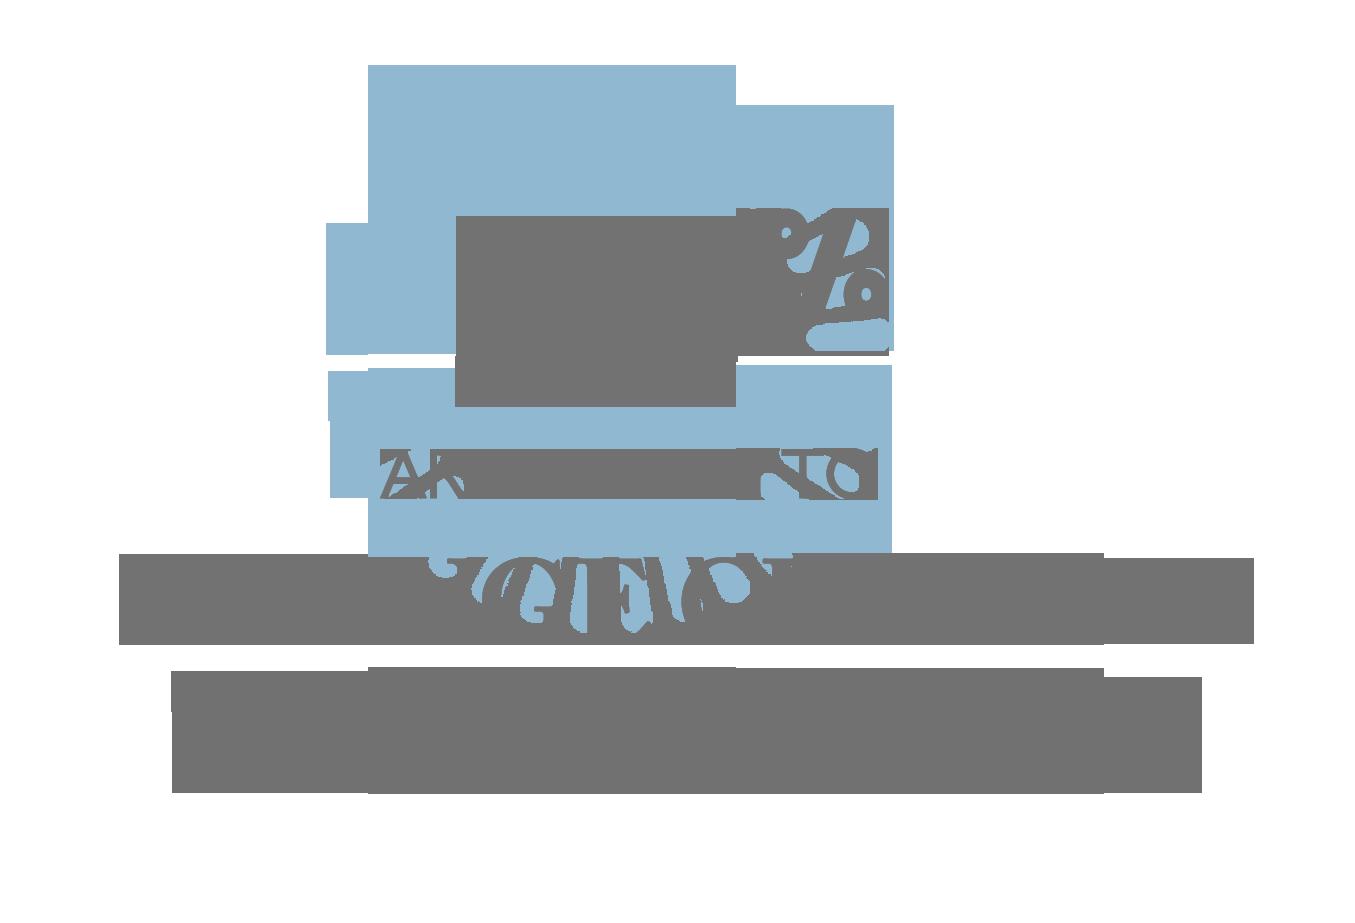 50_percent_change_culture.png